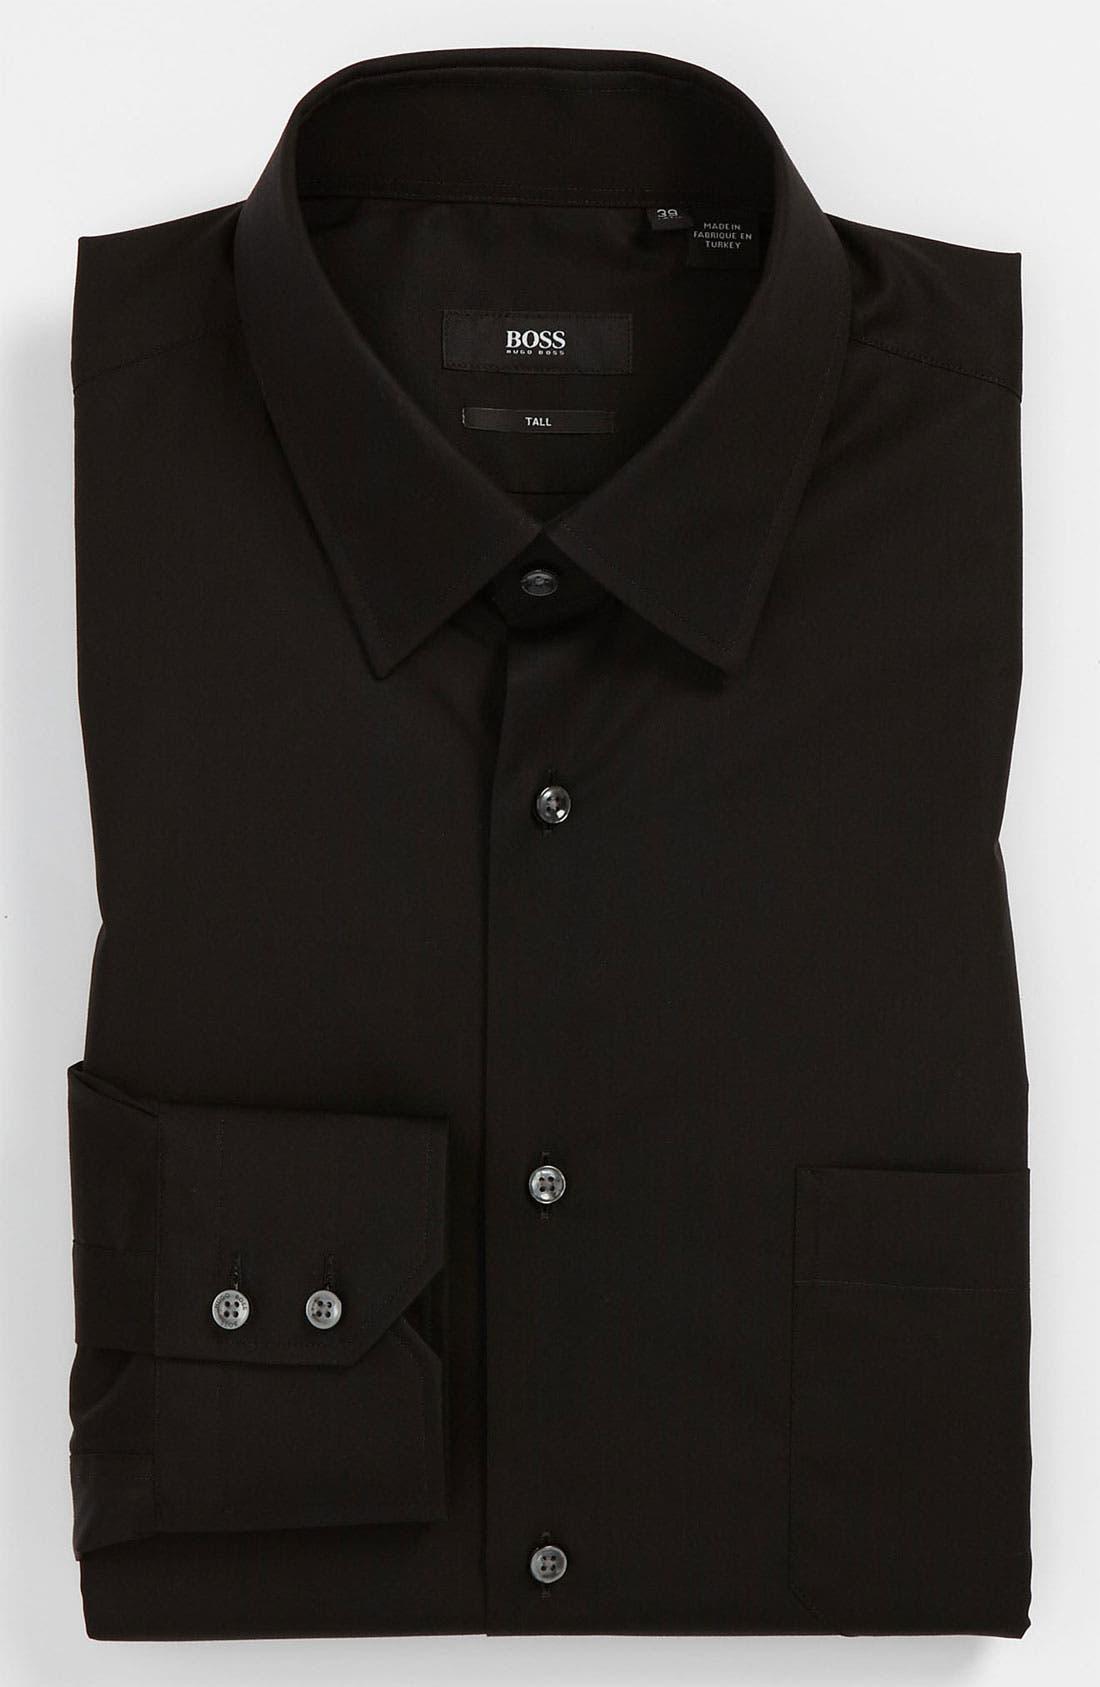 Alternate Image 1 Selected - BOSS Black Regular Fit Dress Shirt (Big & Tall) (Online Exclusive)